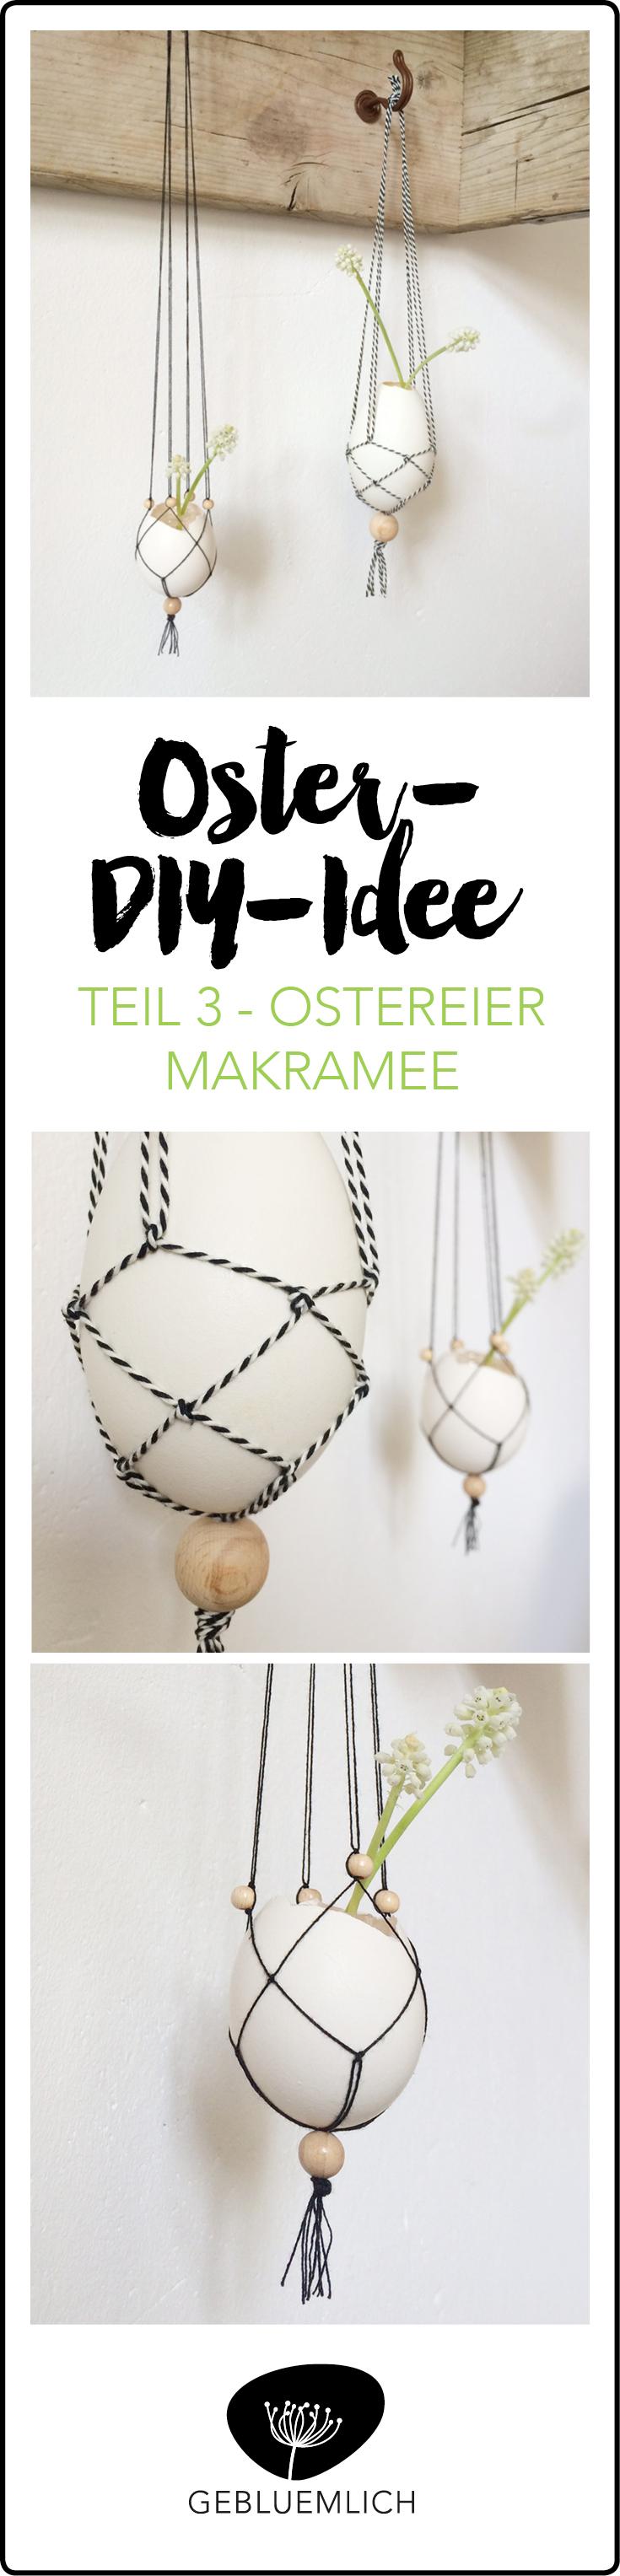 Oster-DIY-Idee Teil 3 Ostereier als Makramee-Vase